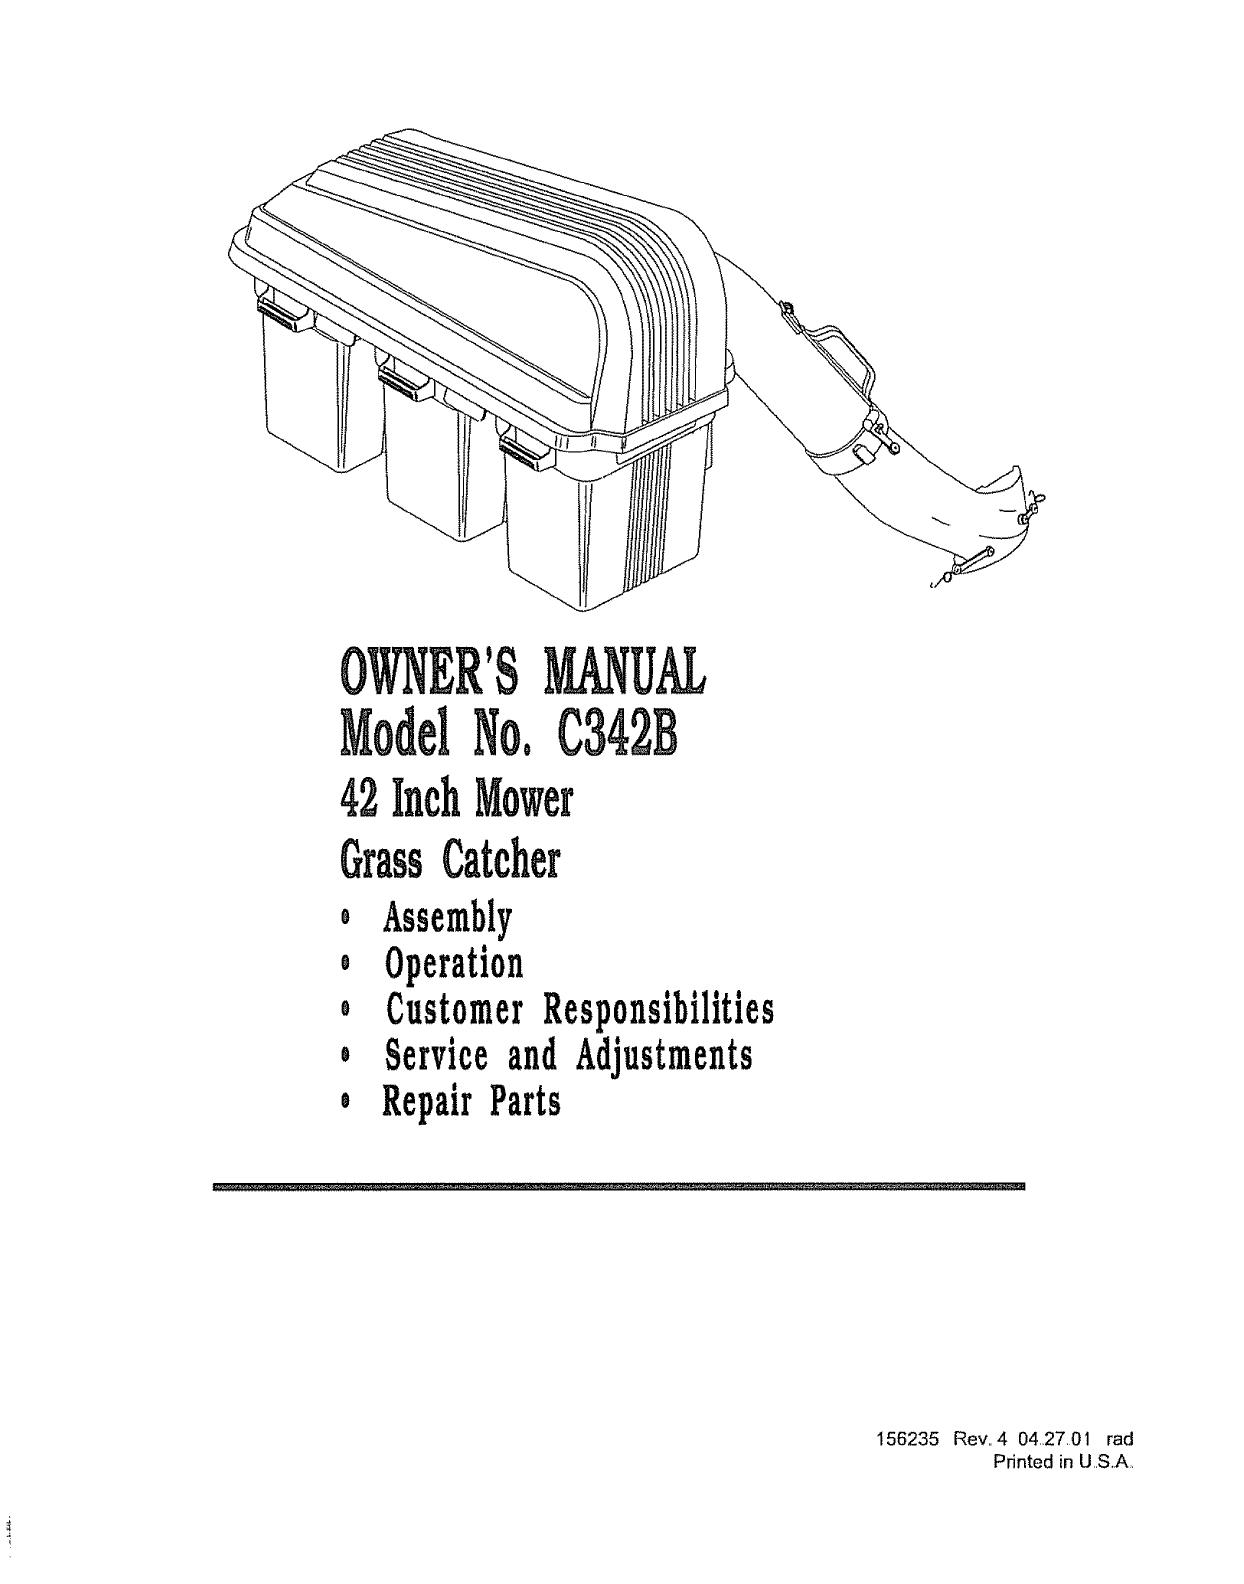 Husqvarna C342B User Manual GRASS CATCHER Manuals And